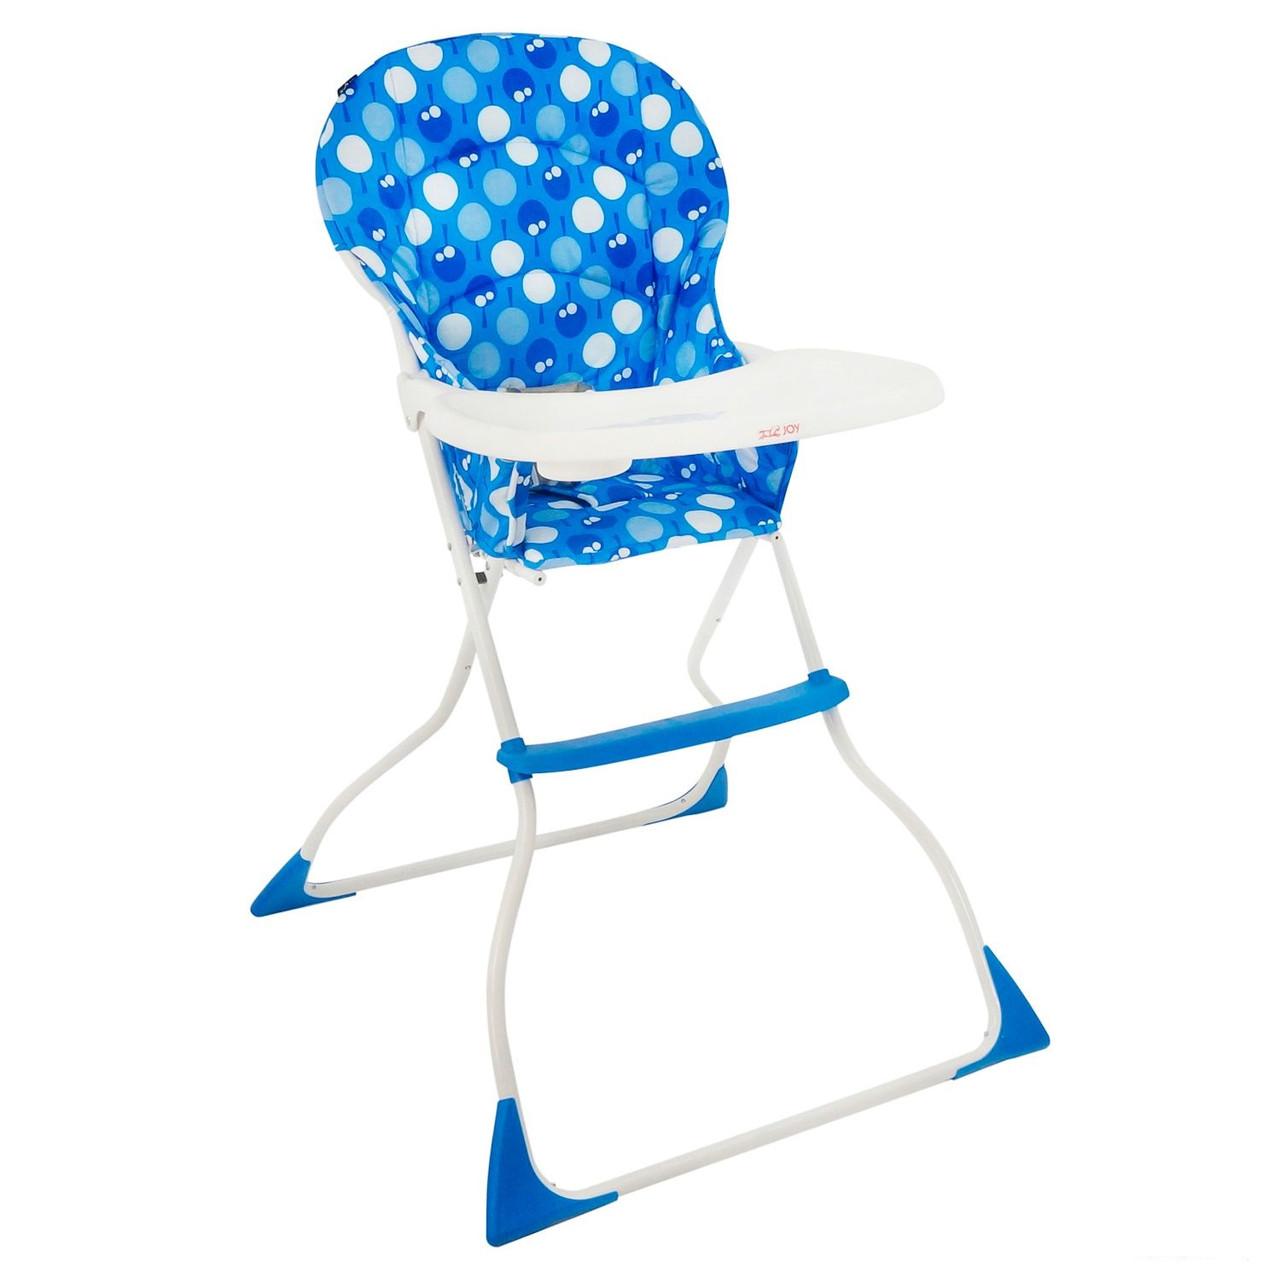 Стульчик для кормления LY 100 Areola blue